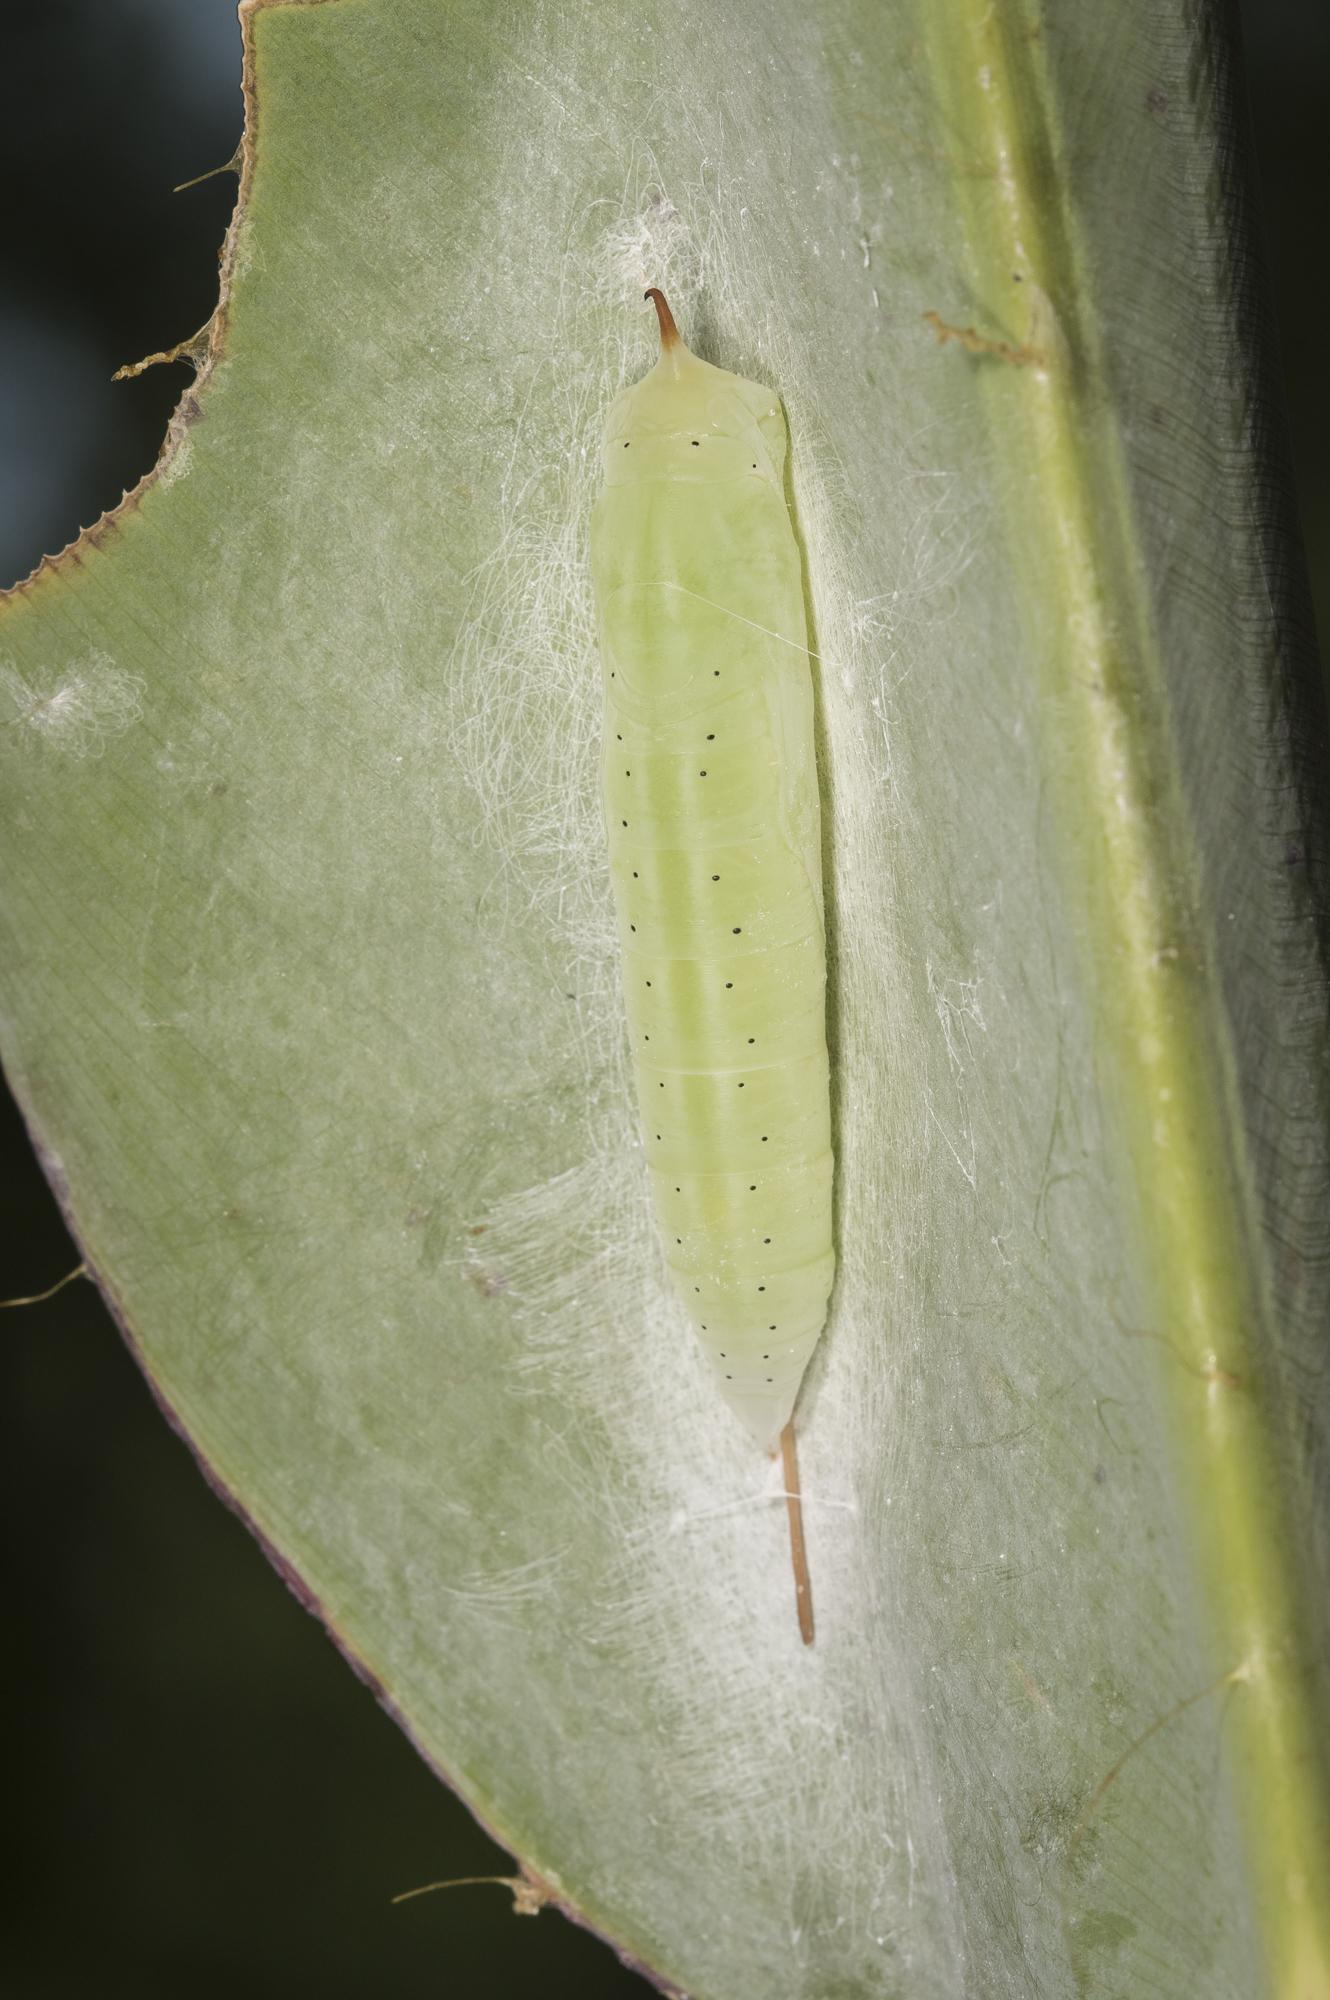 Brazilian skipper chrysalis in rolled leaf